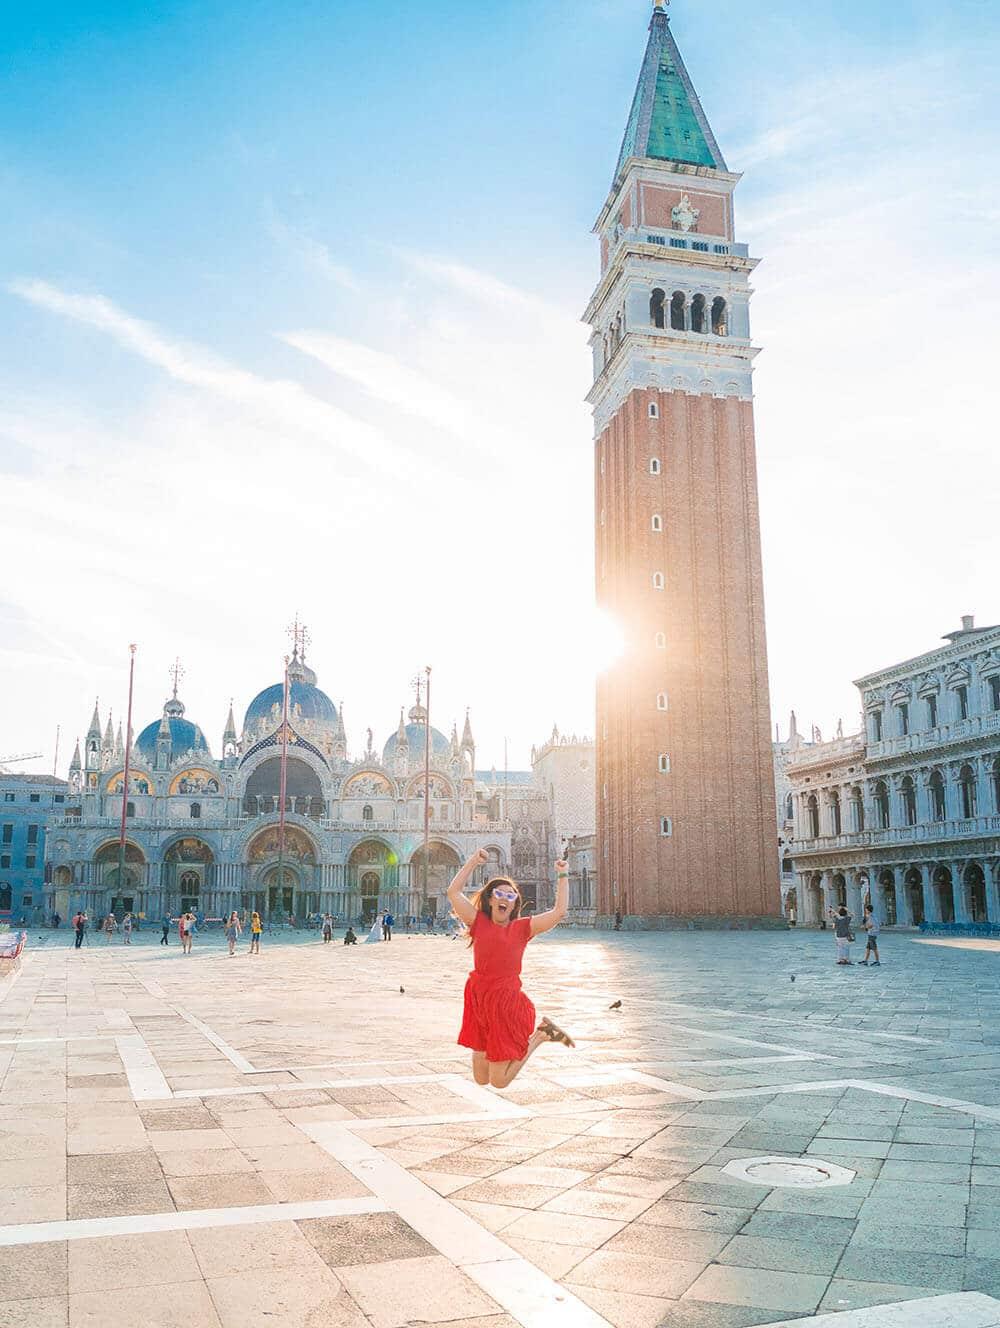 Europe Travel Tips Have Fun